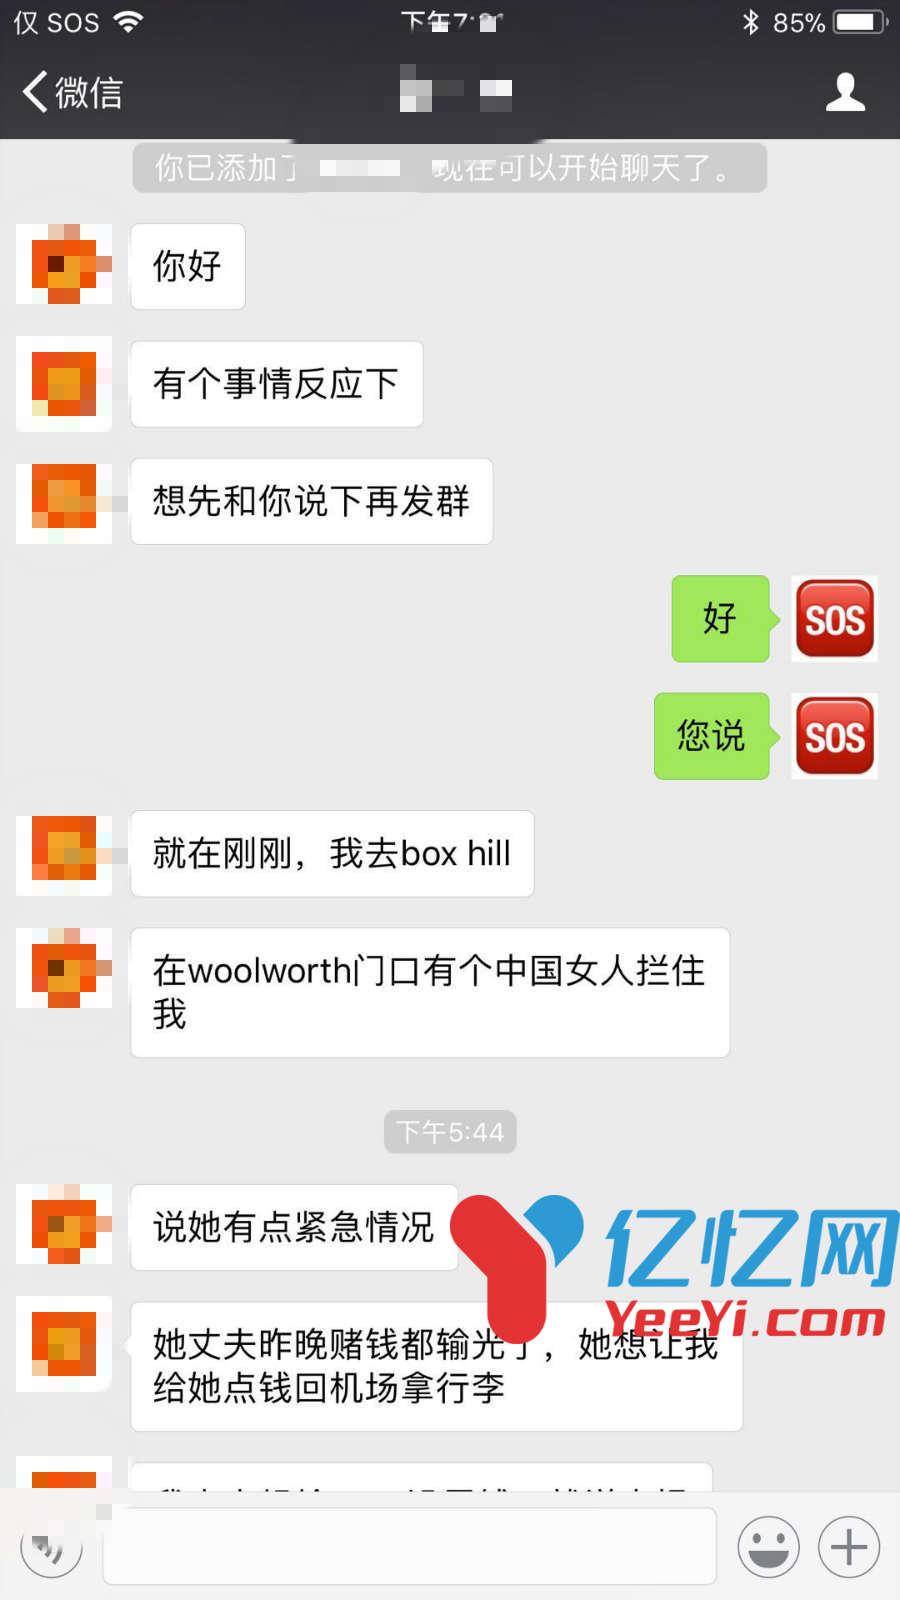 WeChat Image_20180705081705_meitu_1.jpg